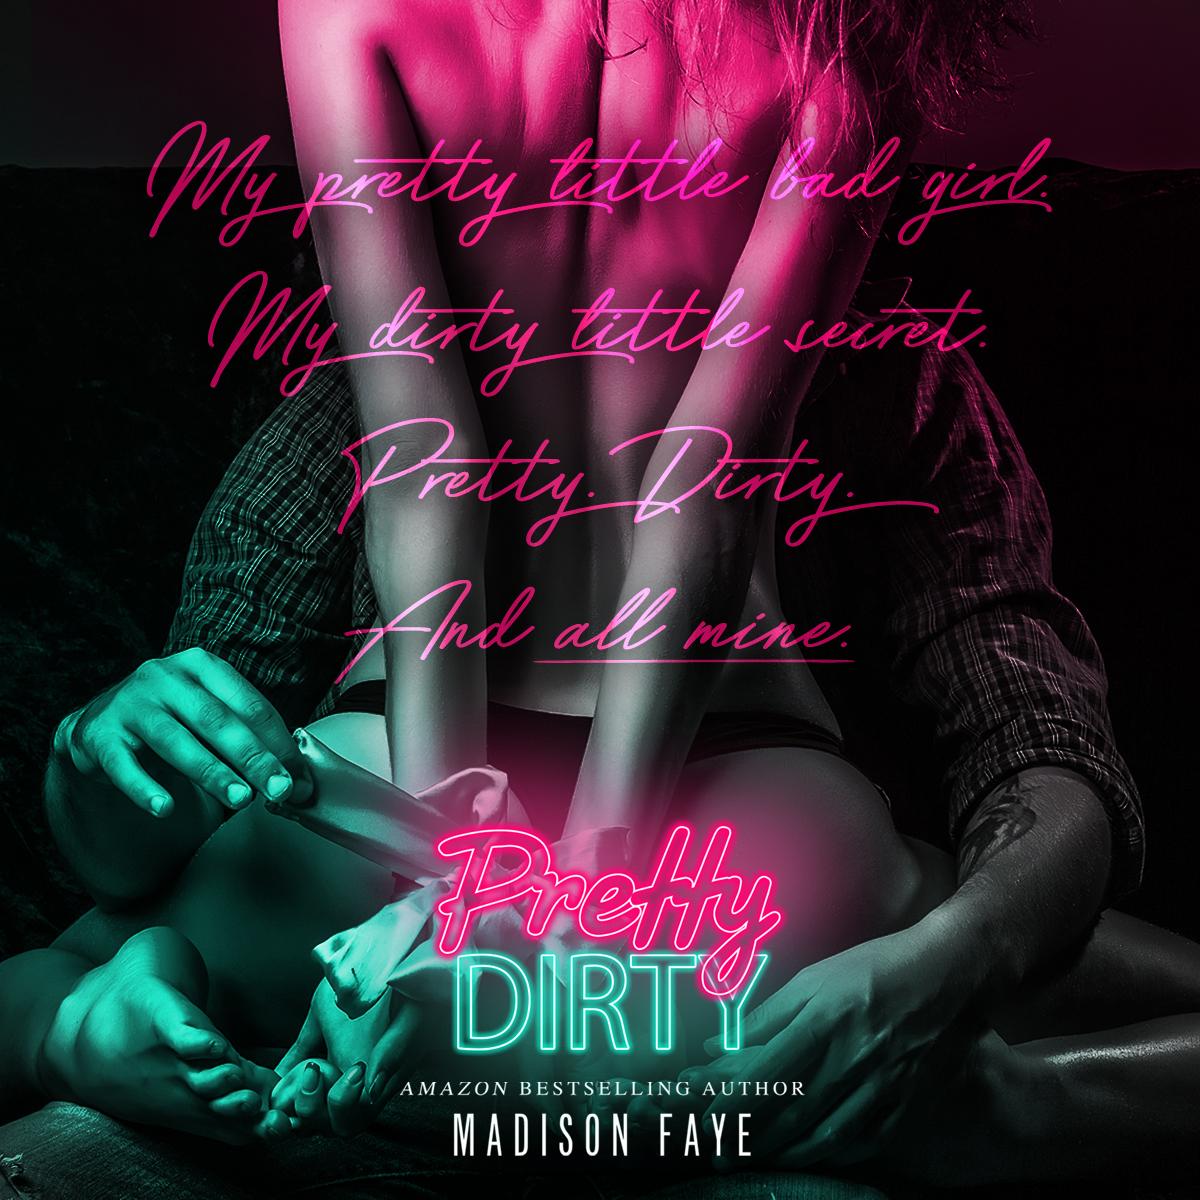 Pretty-Dirty-Teaser-1.jpg